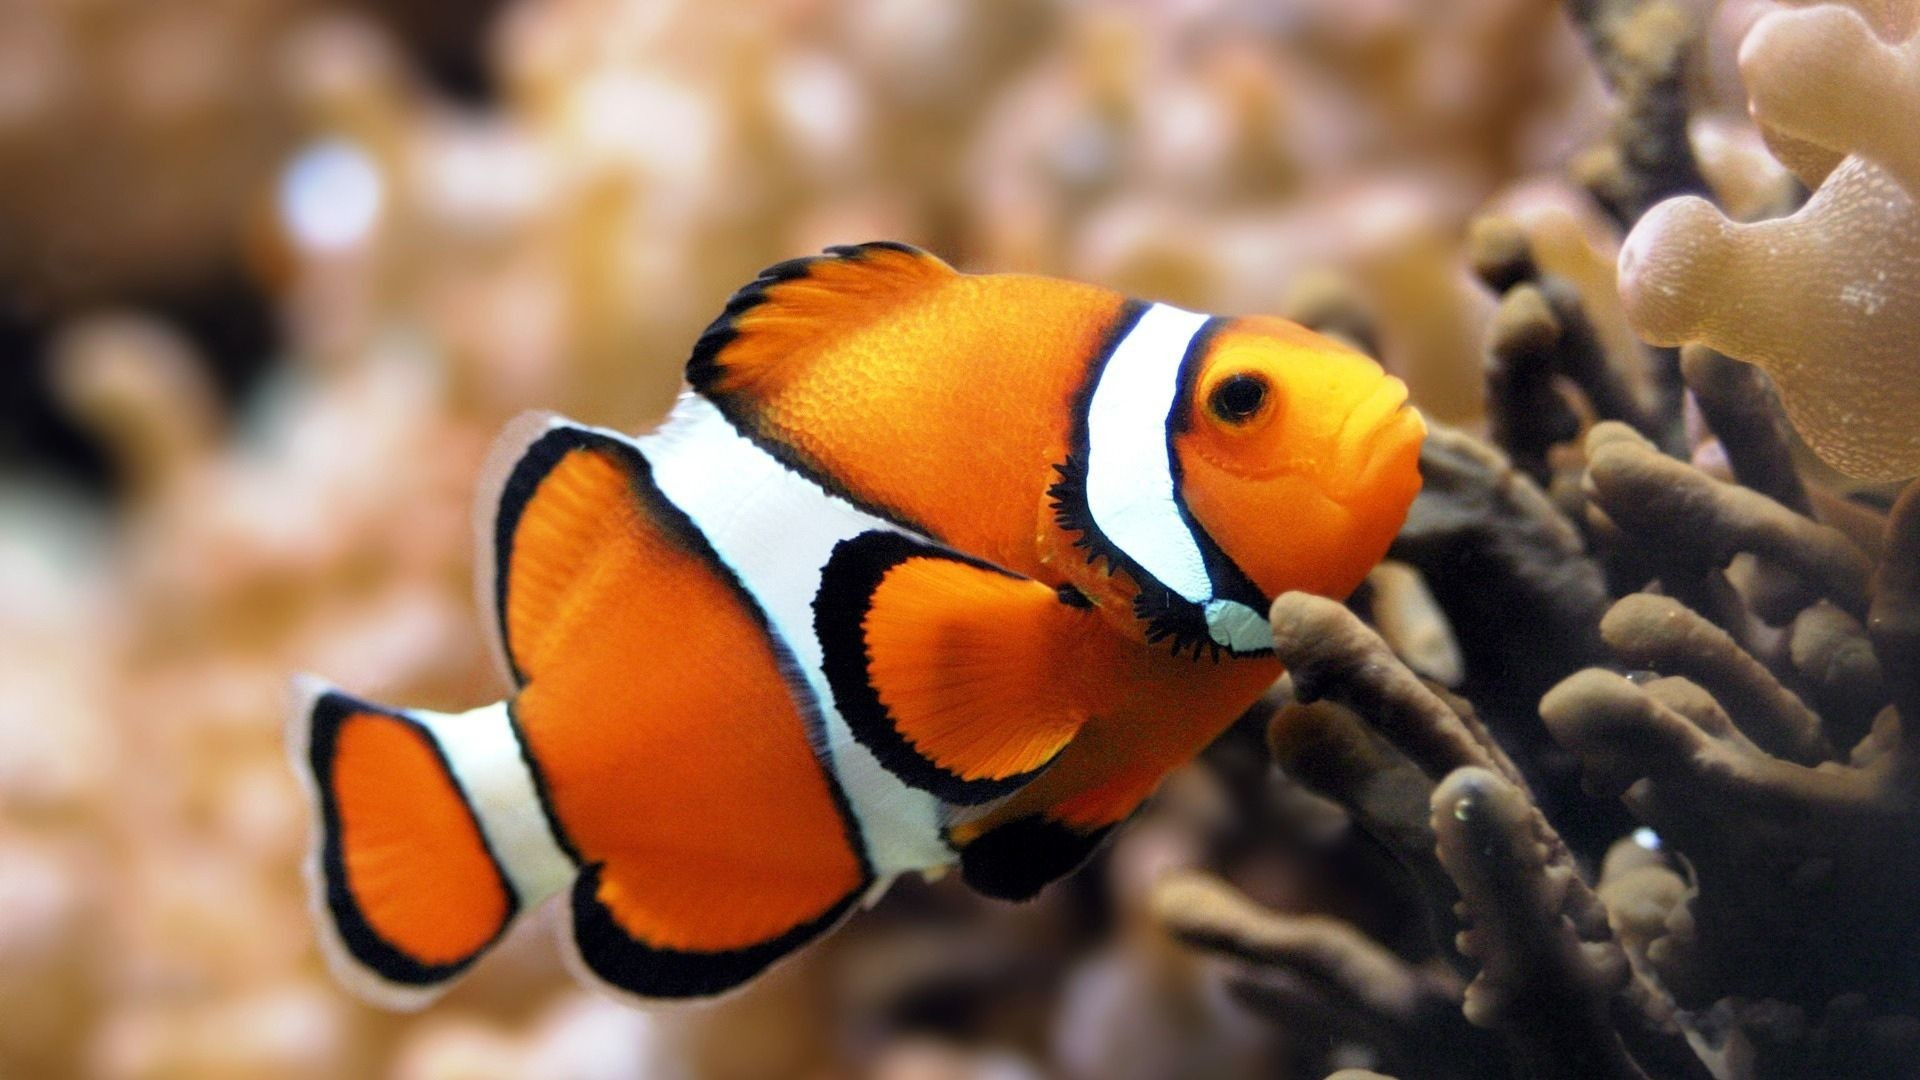 Res: 1920x1080, Full HD 1080p Fish Wallpapers HD, Desktop Backgrounds